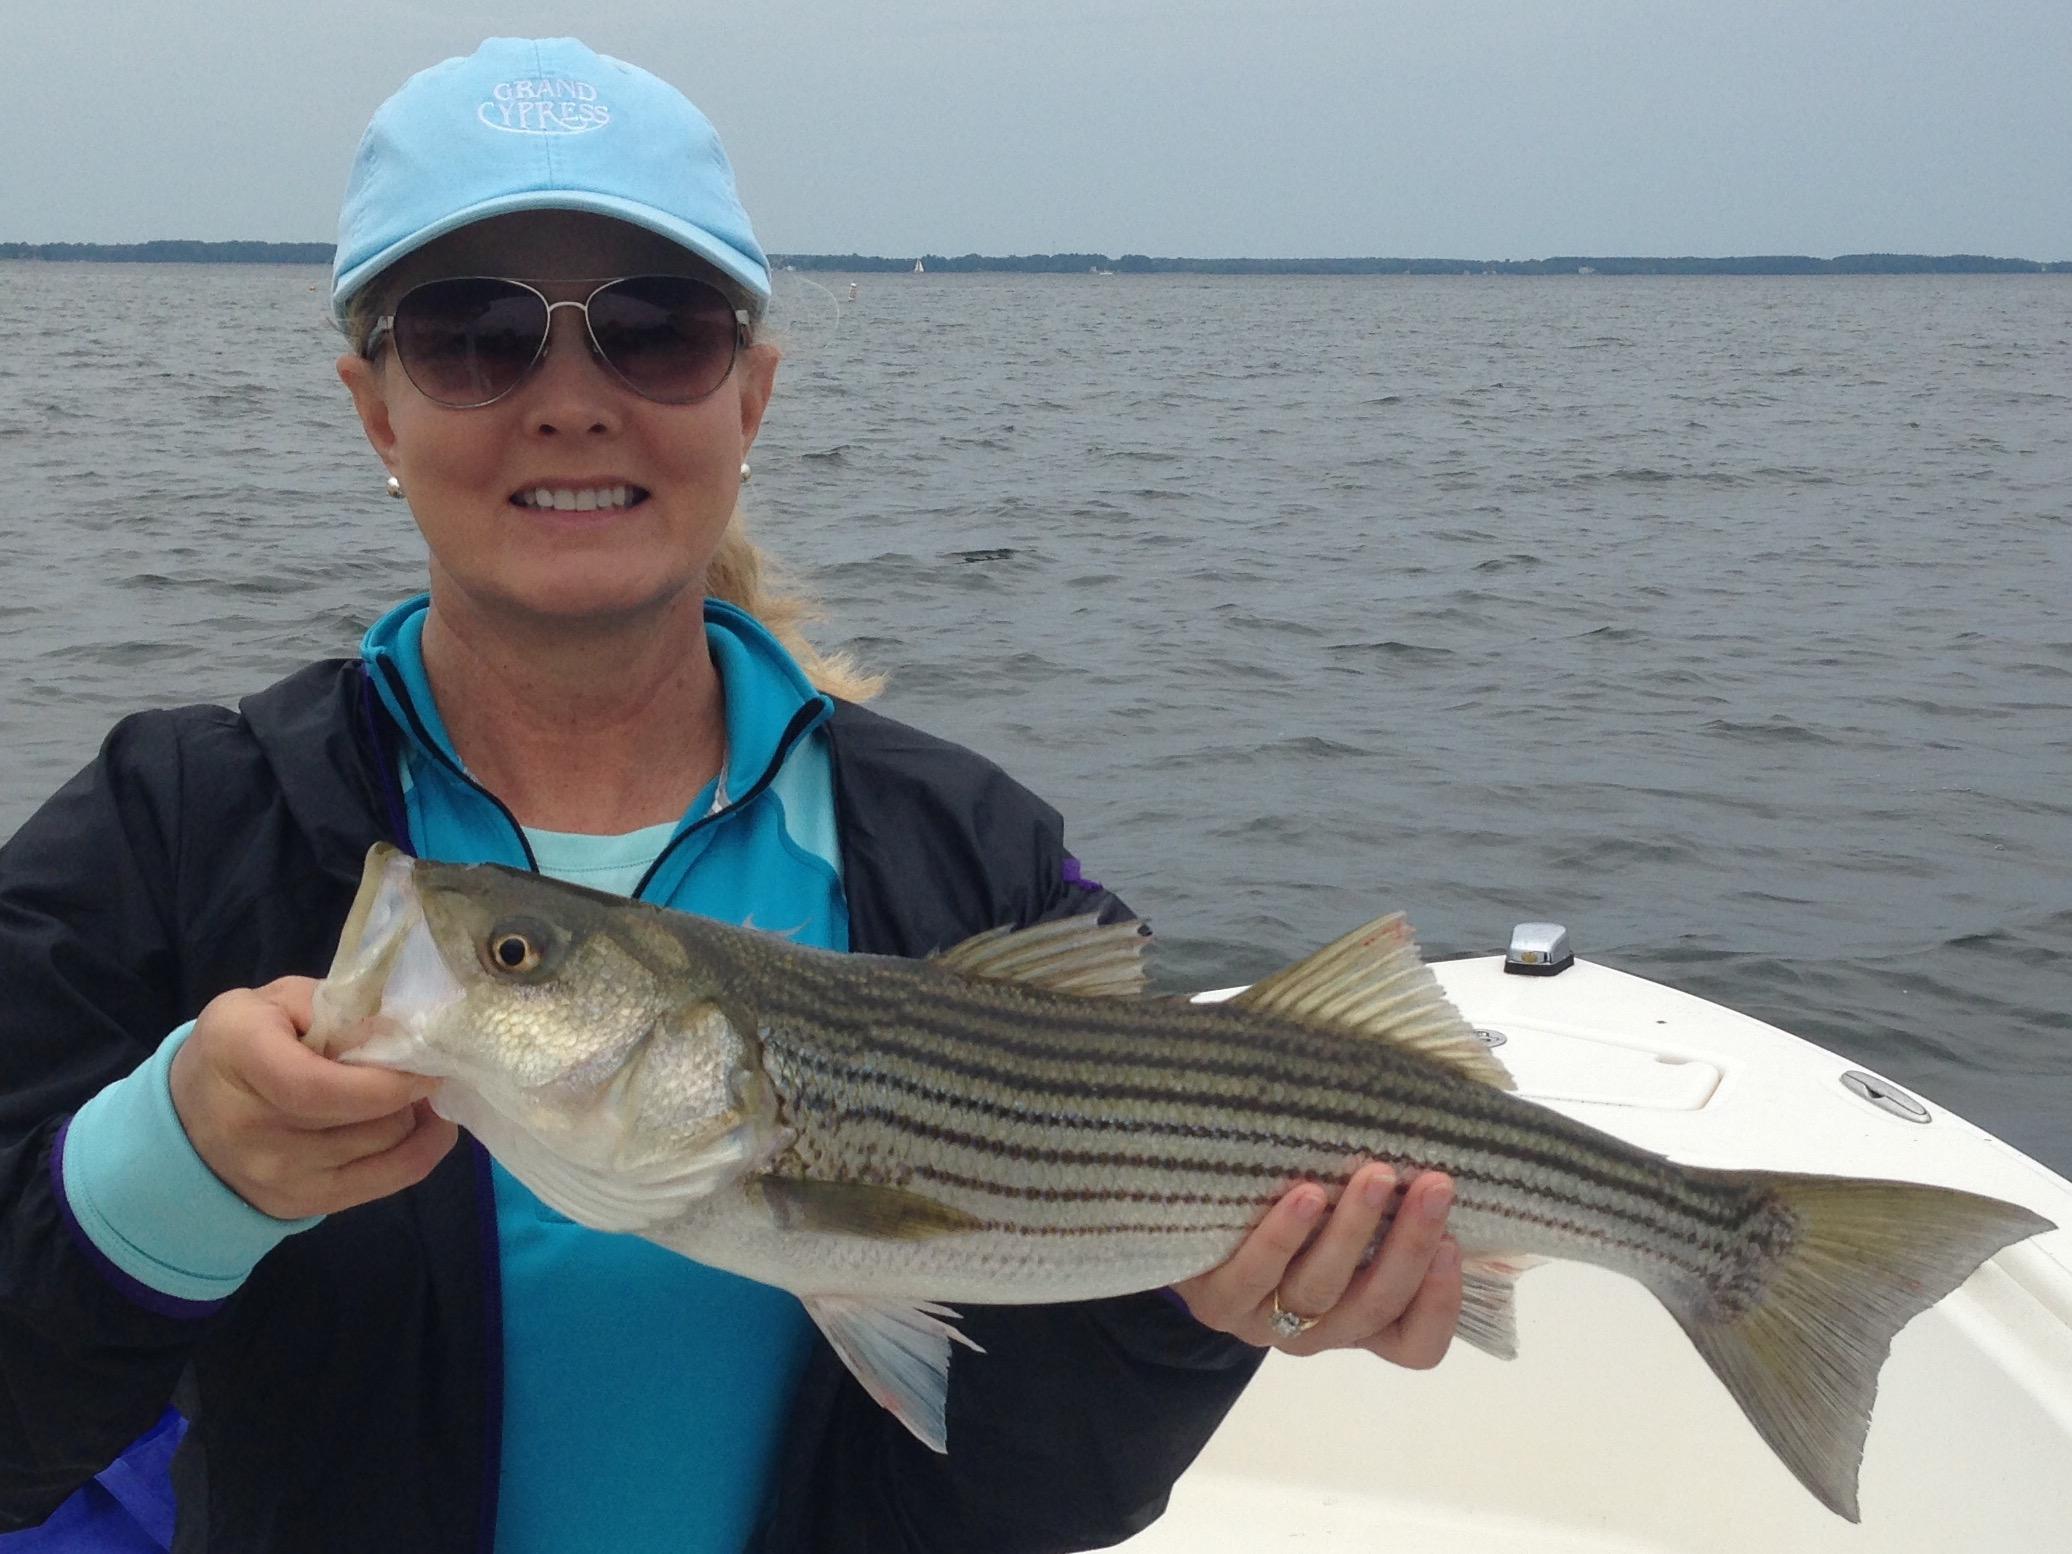 6 8 17 fly fish the chesapeake bay for Fishing chesapeake bay